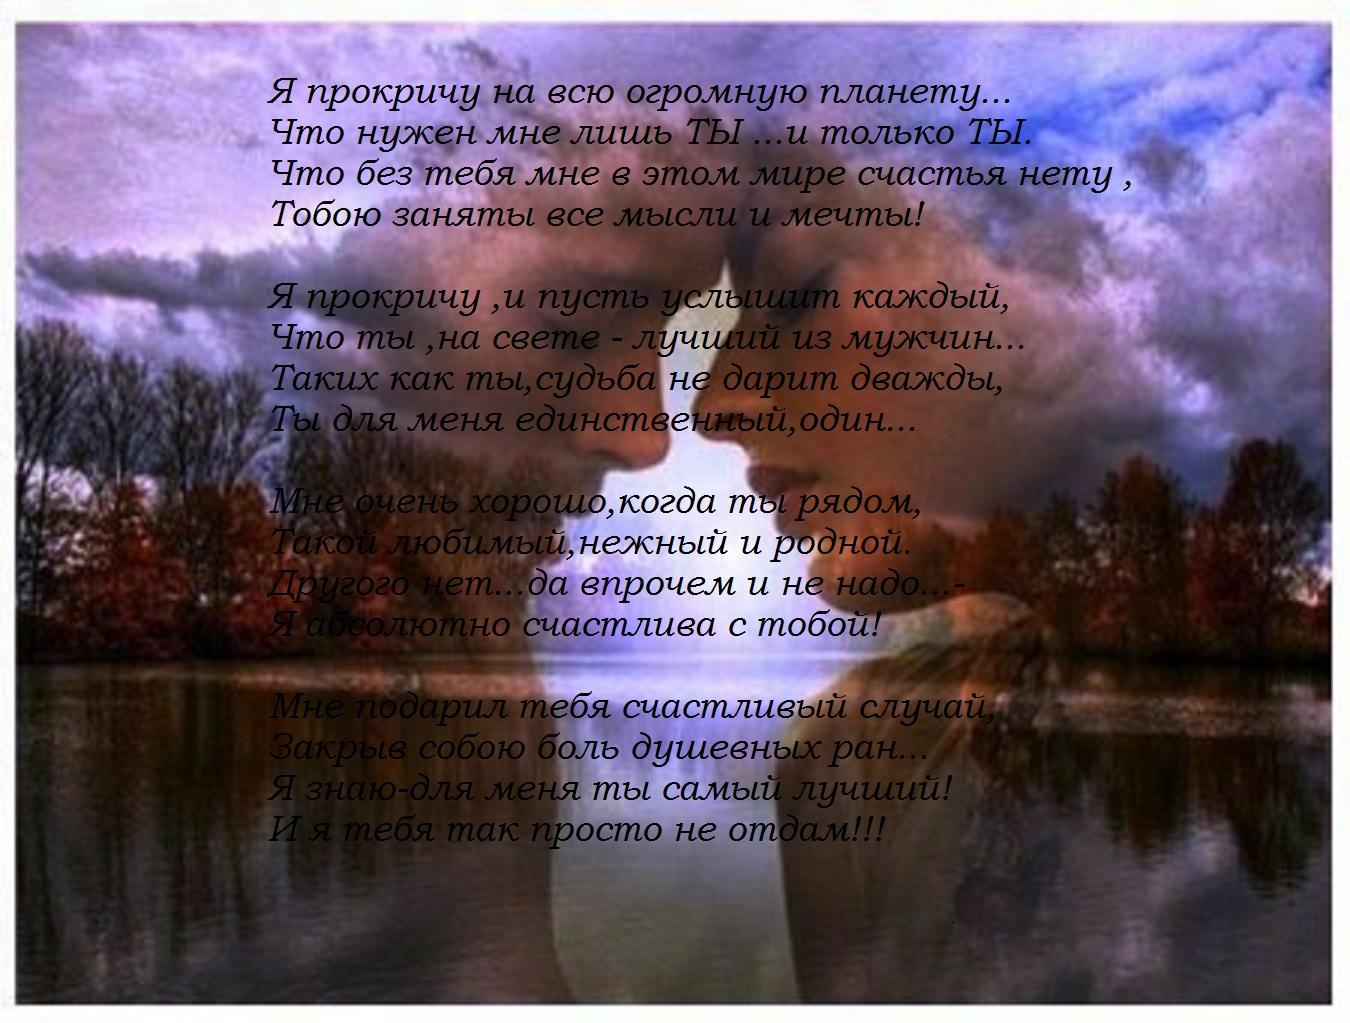 http://s1.uploads.ru/XbJ8A.jpg